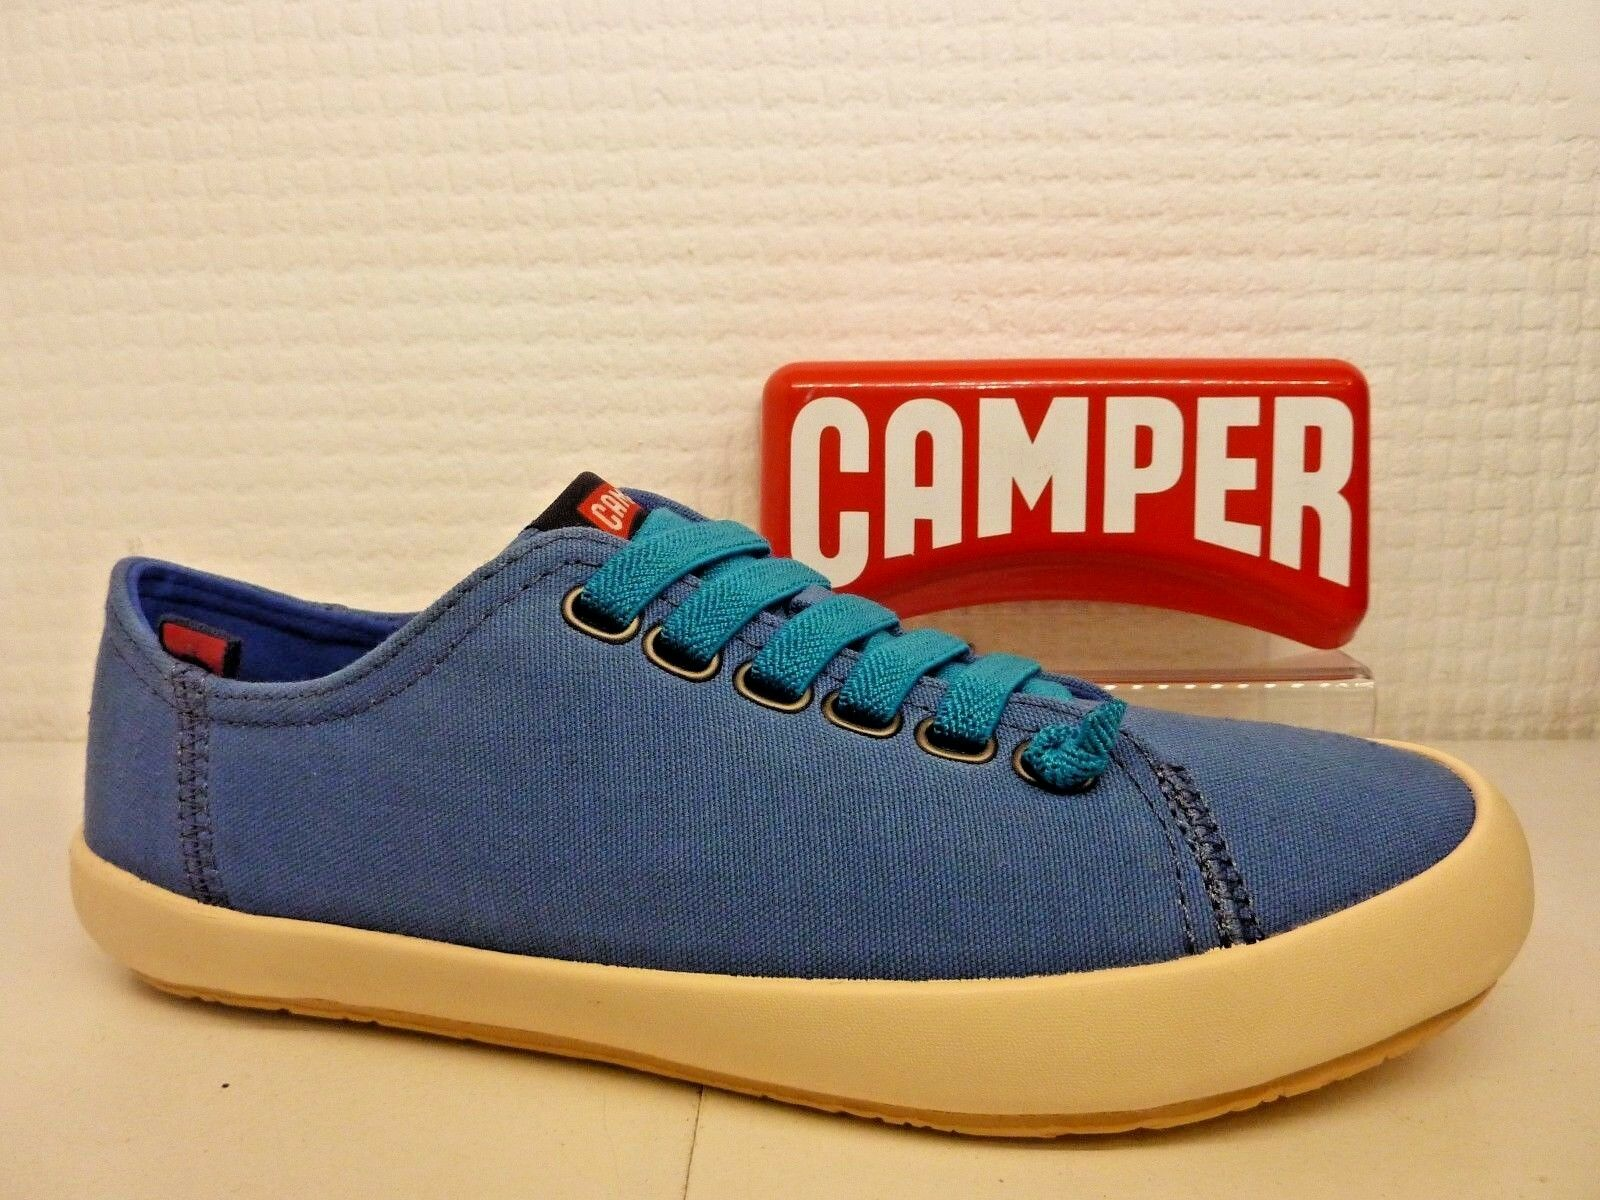 Camper transmitidas por K200284-008 Azul Textil Elástico Encaje Damas Zapatilla Zapato